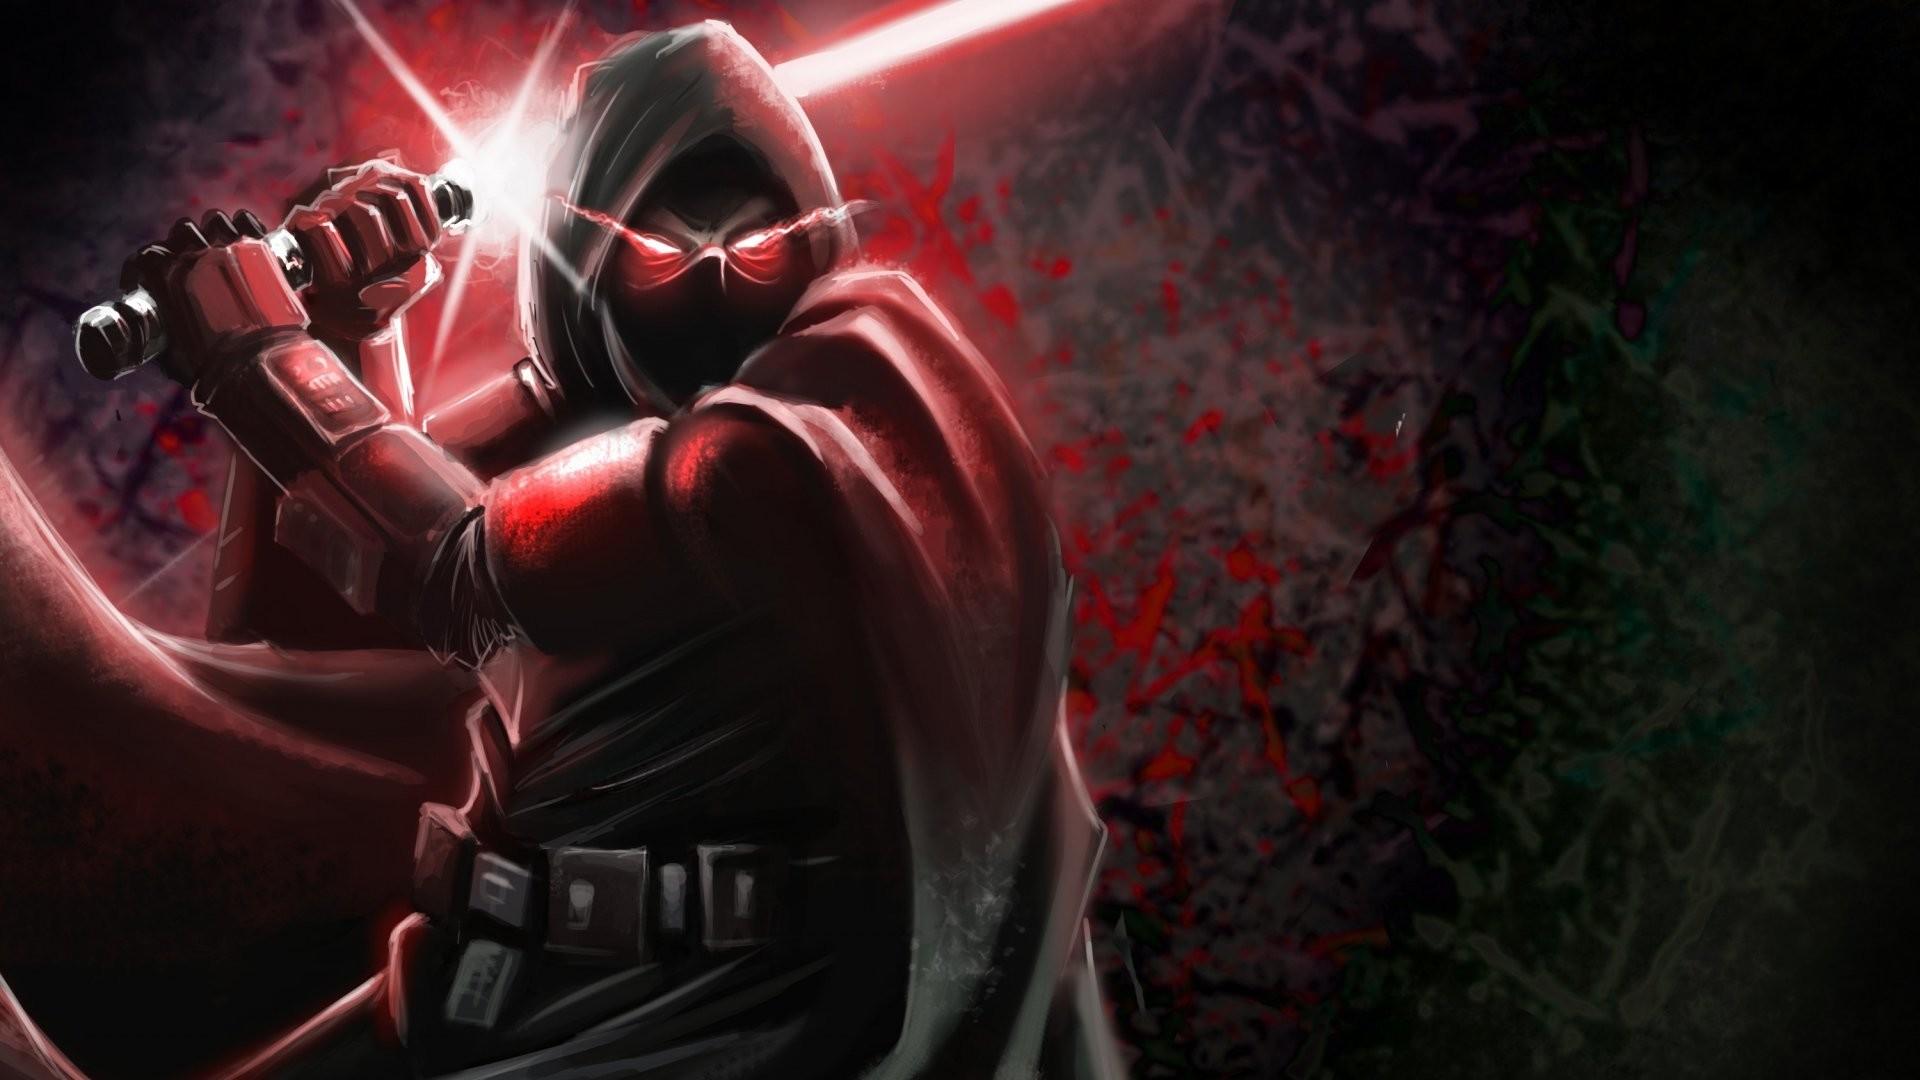 Res: 1920x1080, Sith Star Wars Dark Side Wallpaper -  |